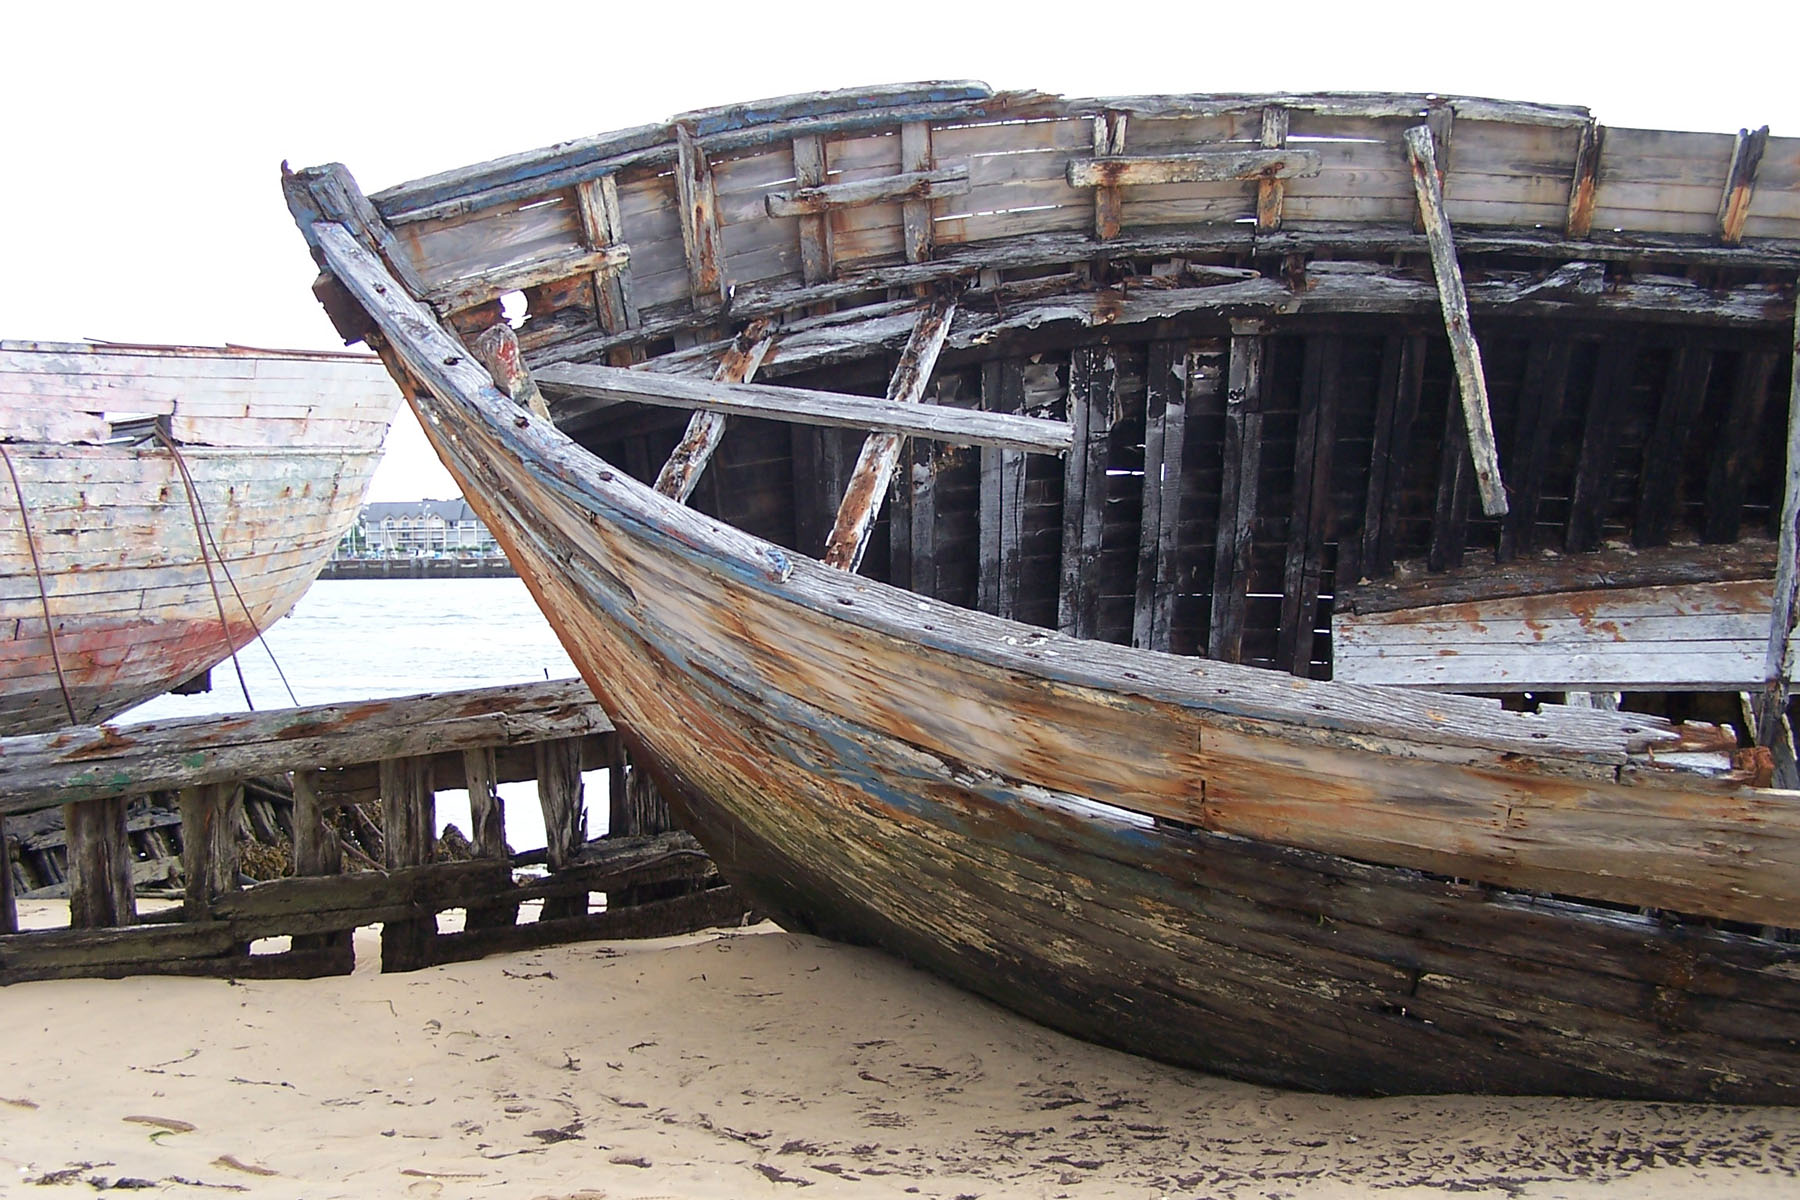 https://www.ex-voto-marins.net/mes_realisations/vieilles-coques_epaves_vieux-navires/56Plouhinec-LeMagouer63.jpg